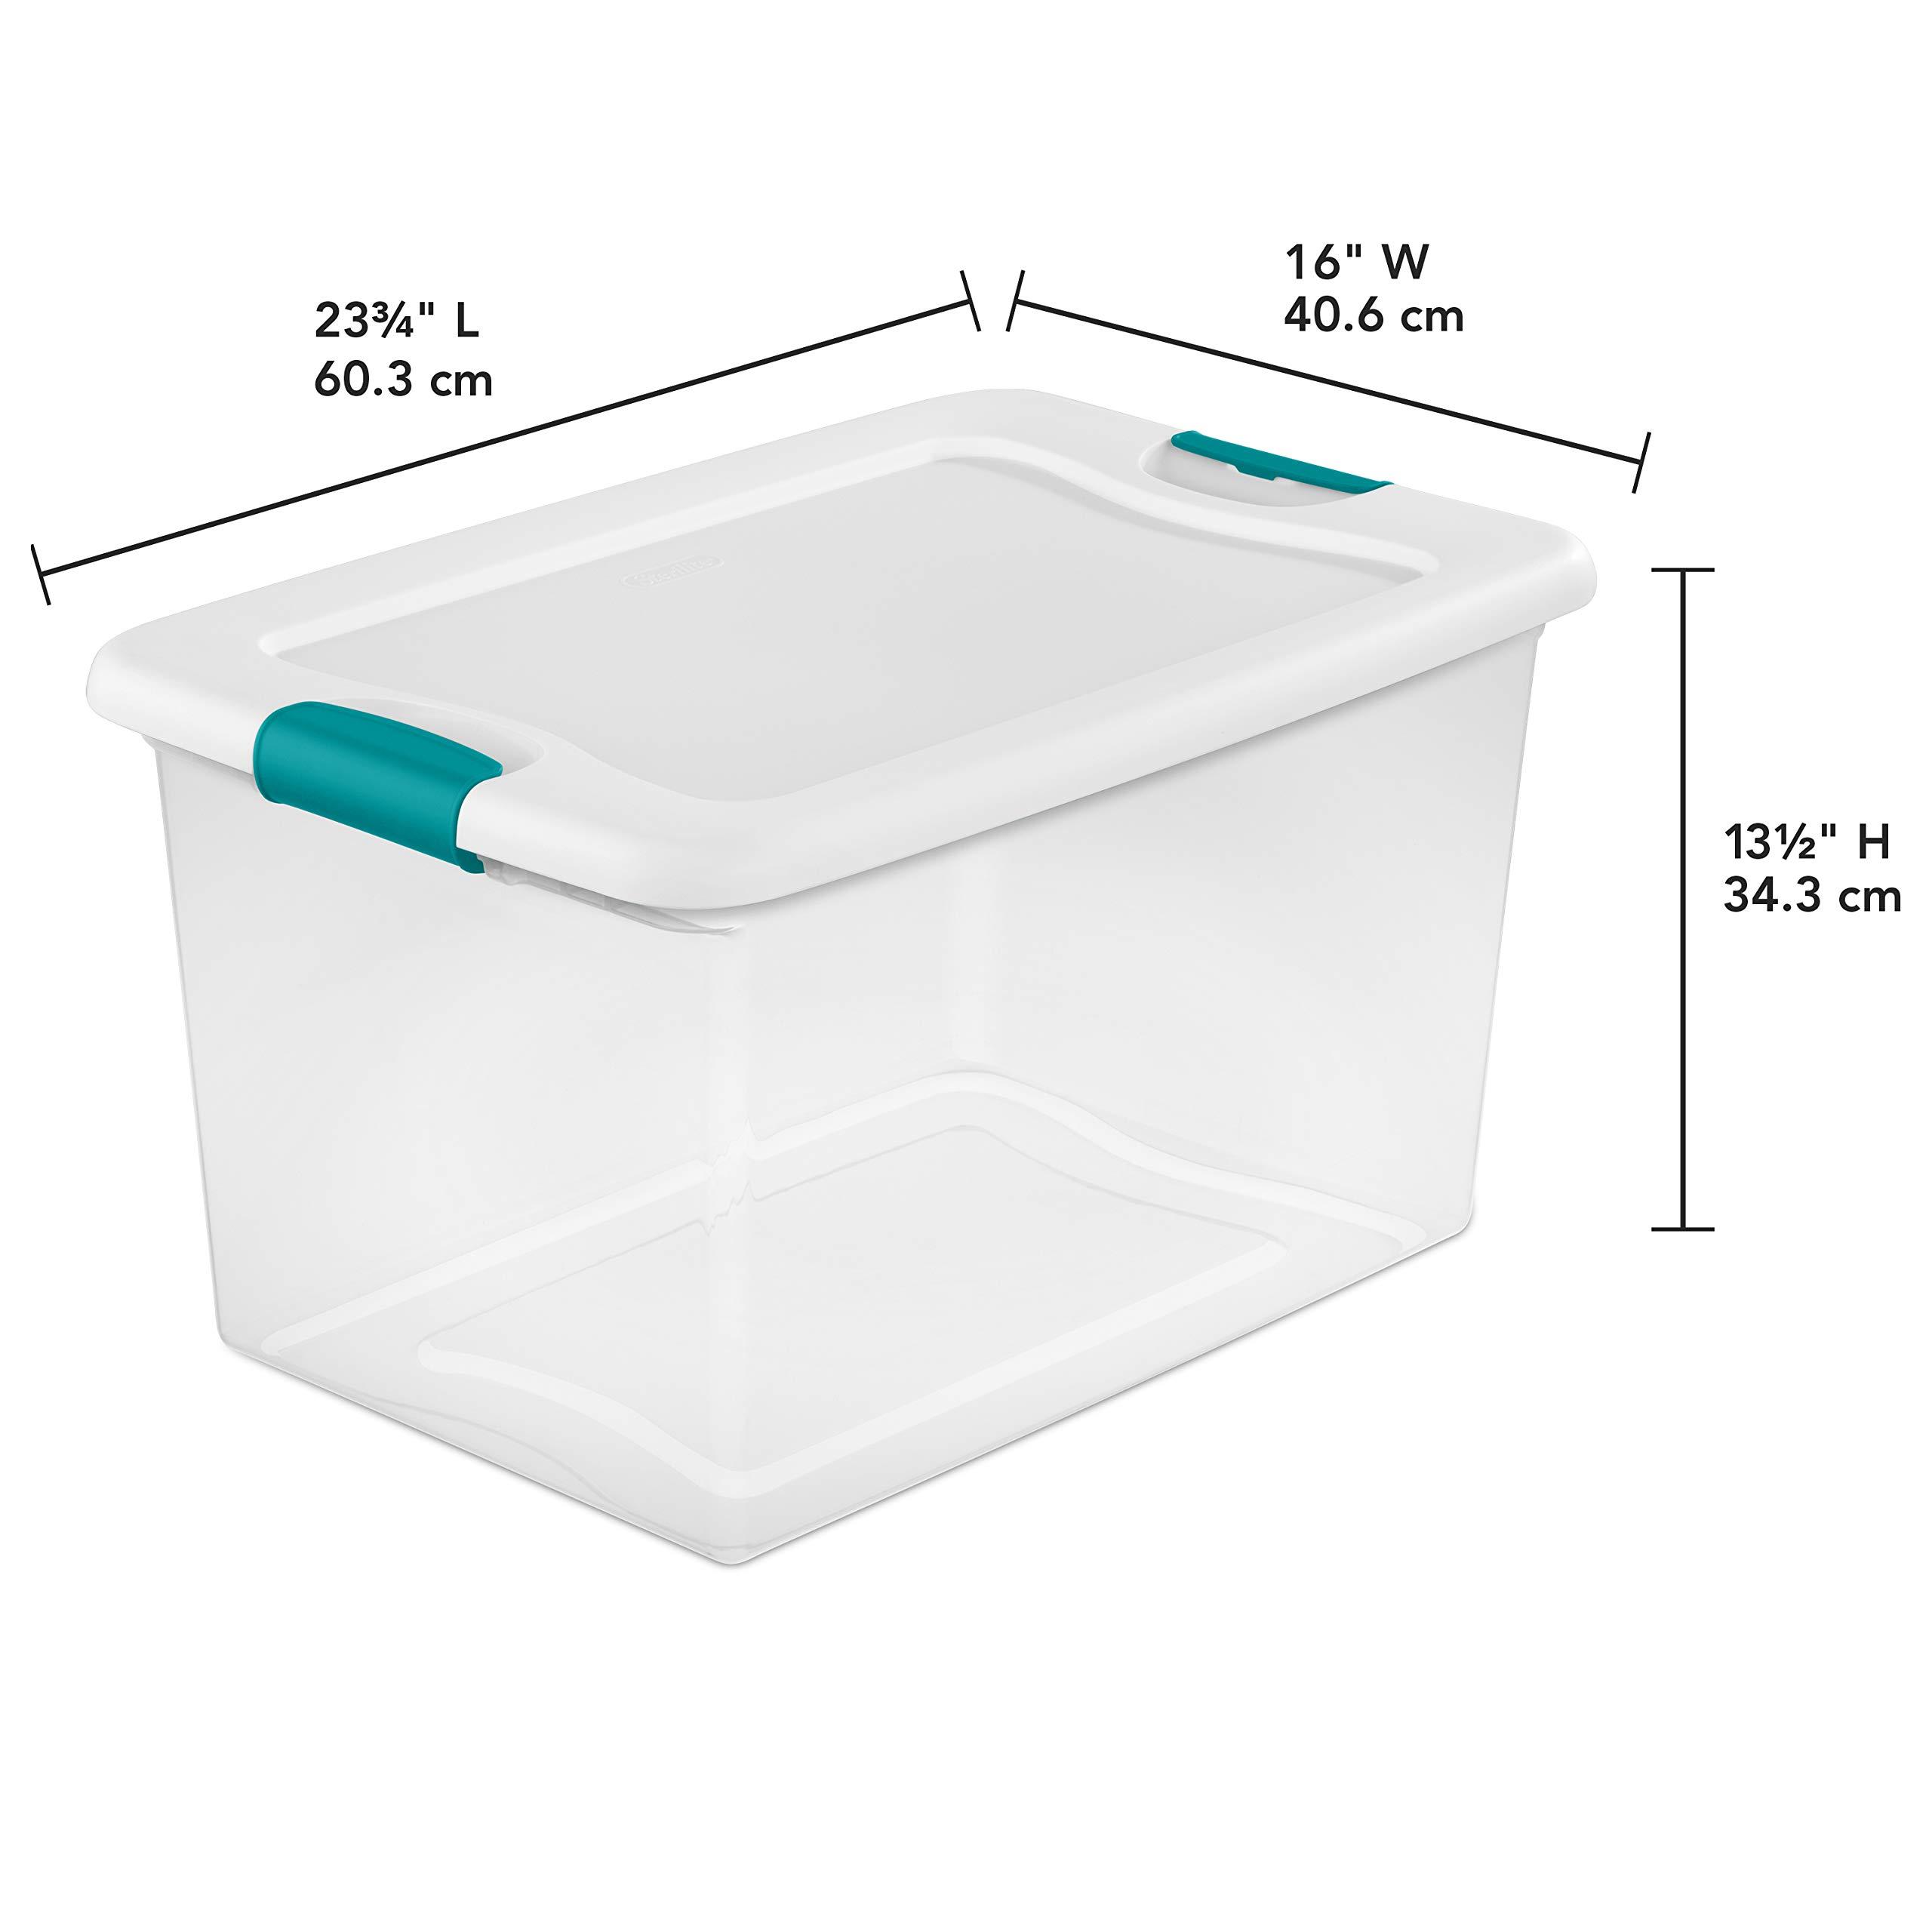 Sterilite 64 Quart Latching Plastic Storage Box, Clear w/Blue Latches (12 Pack) by STERILITE